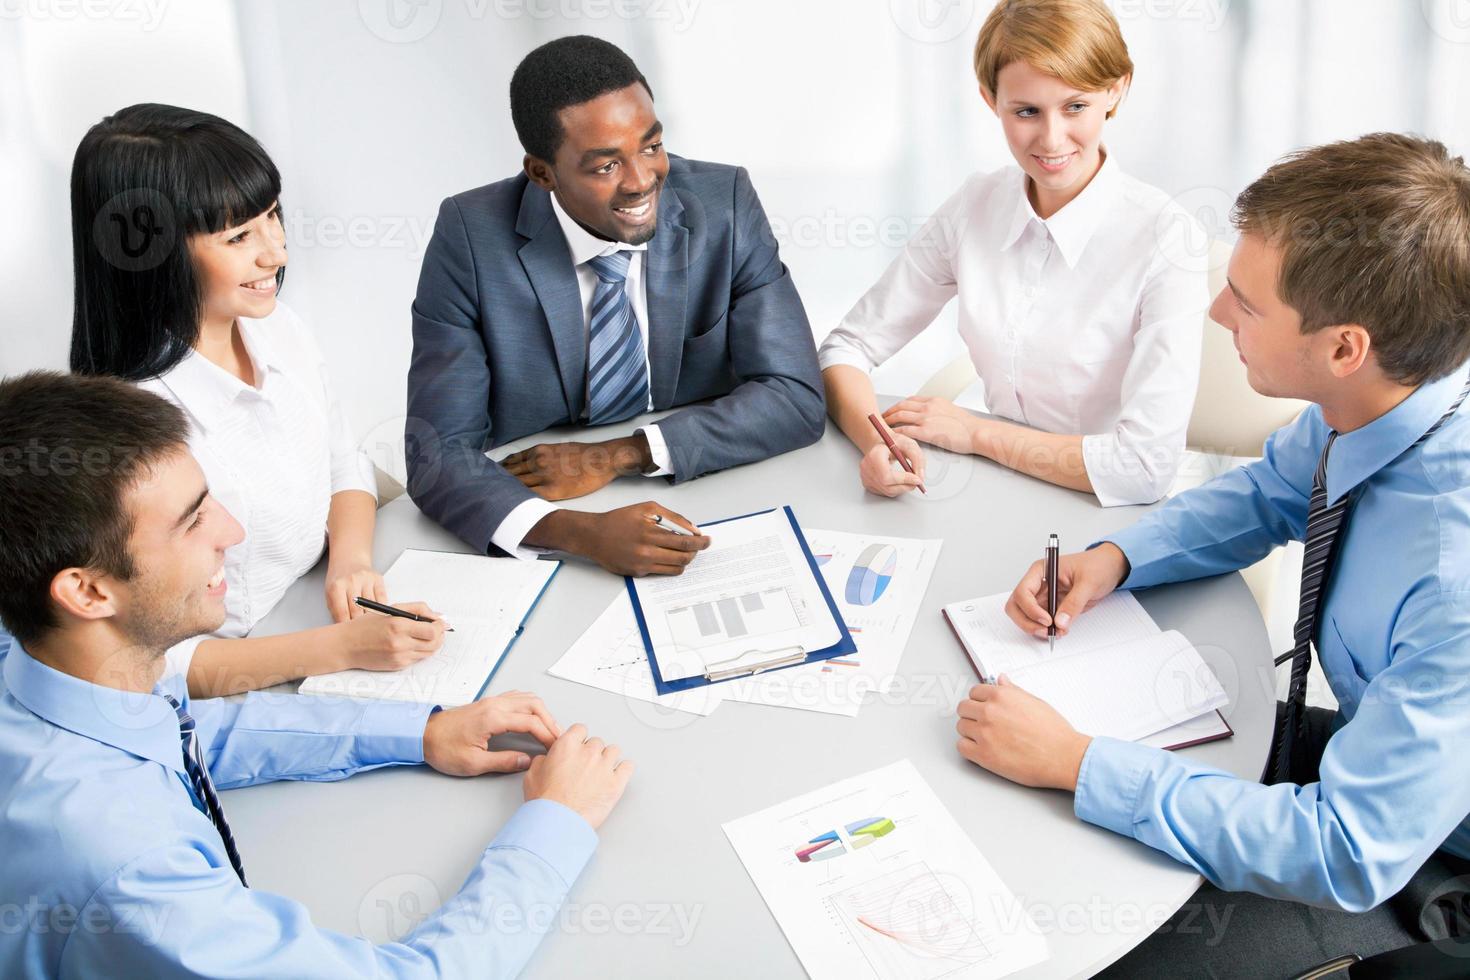 zakelijke groep bijeenkomst portret foto